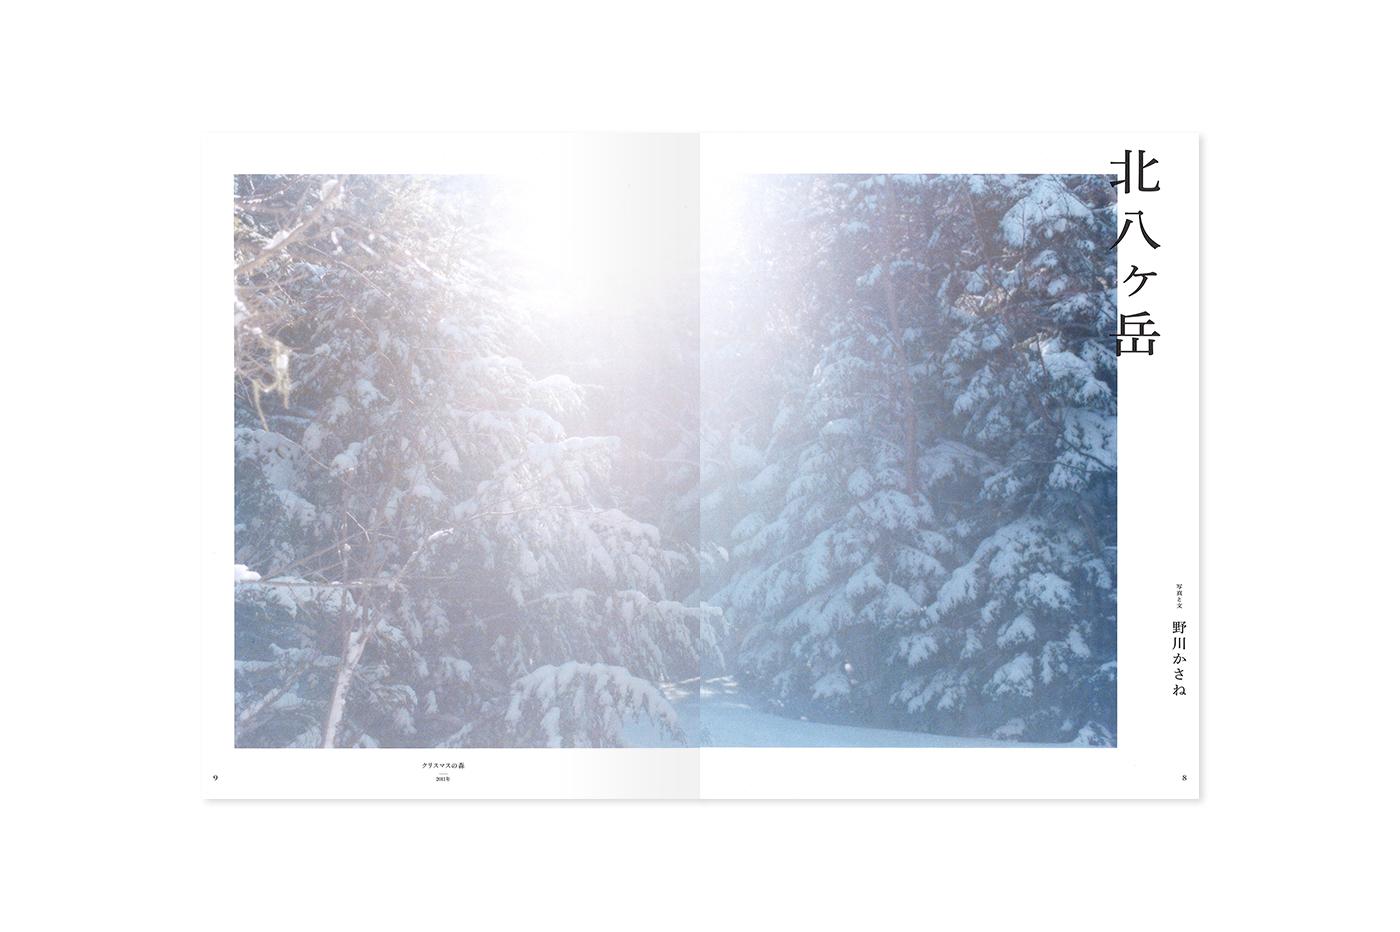 wv12_2017_2